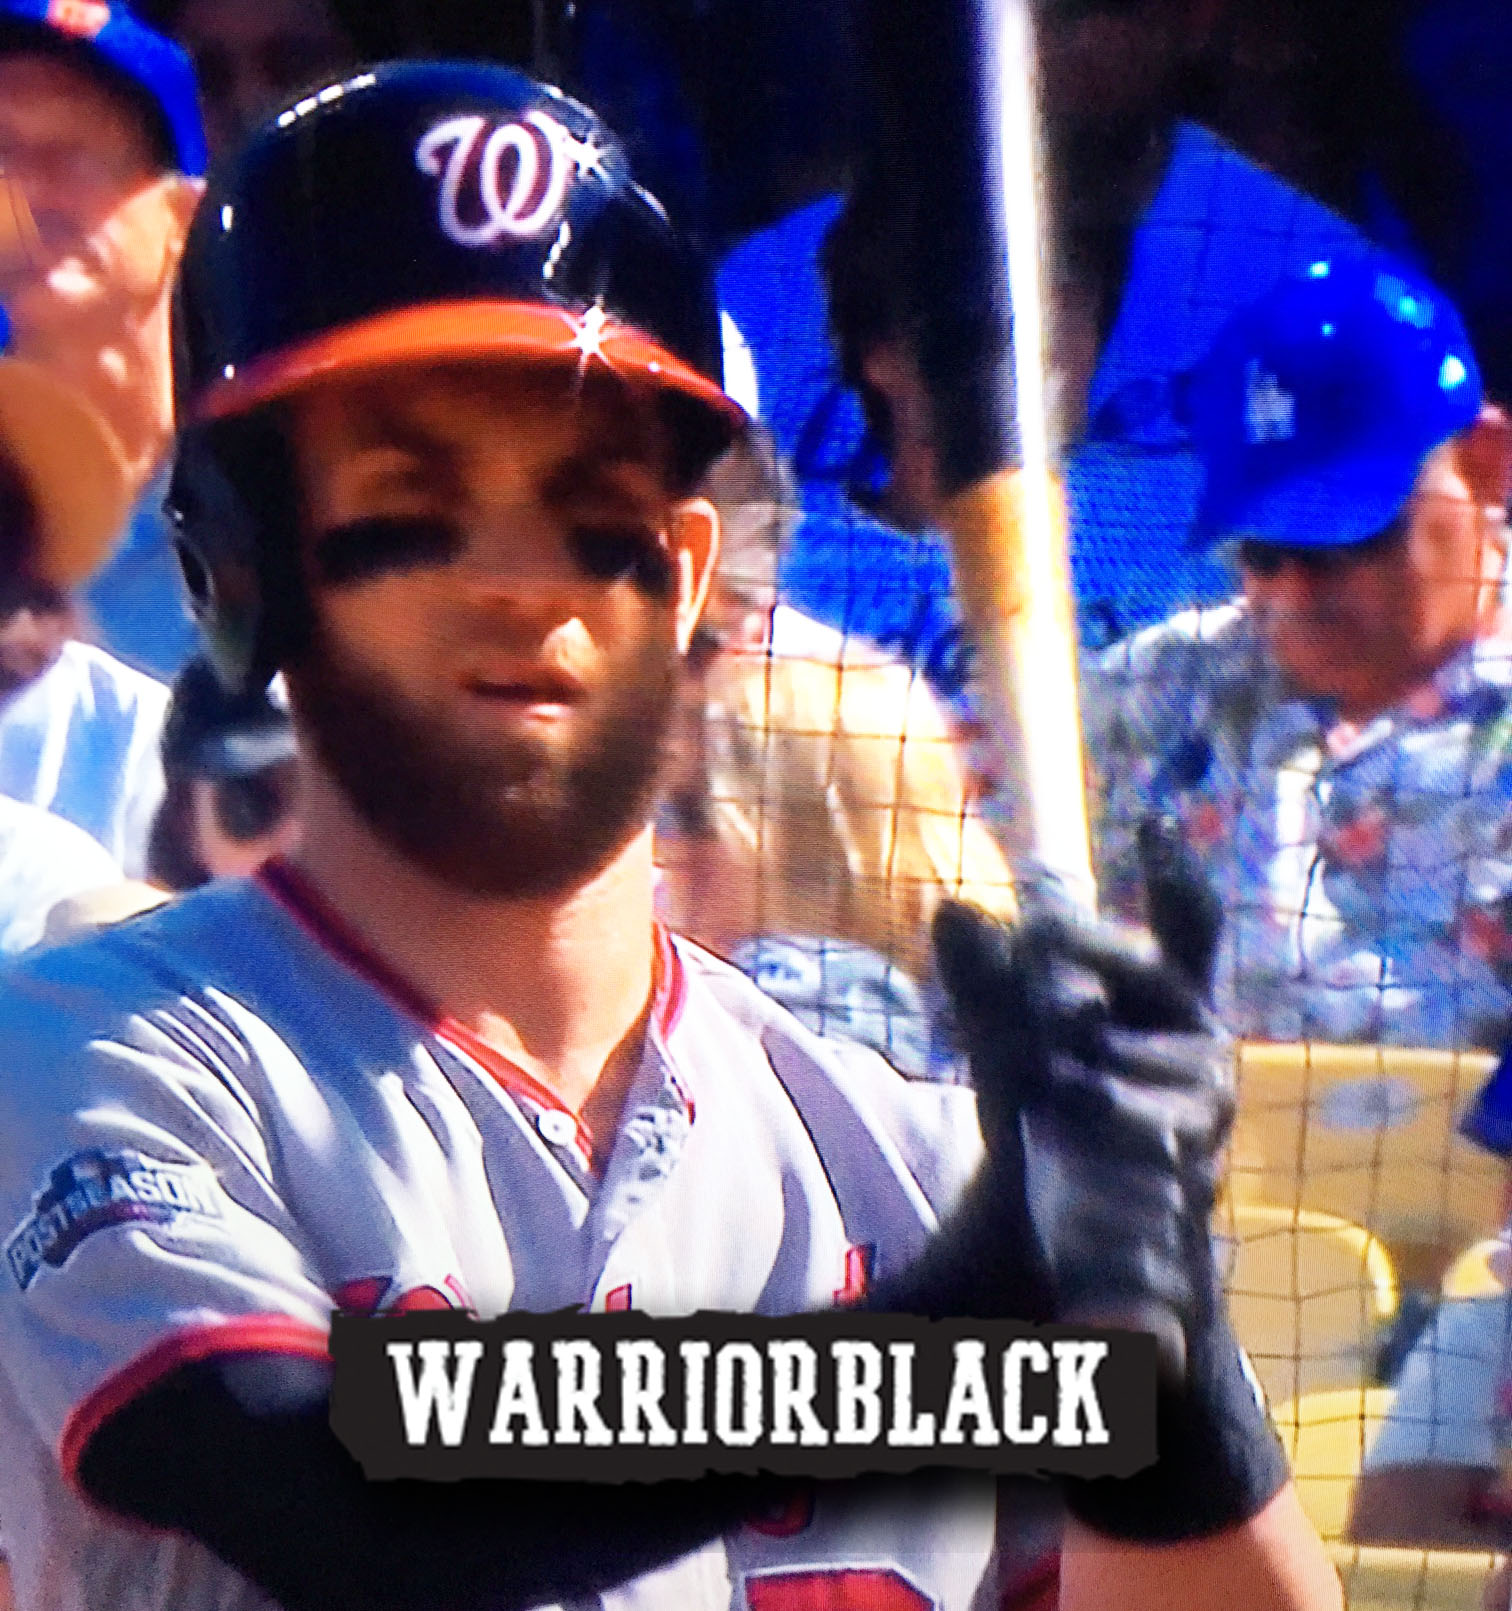 bryce_warriorblack